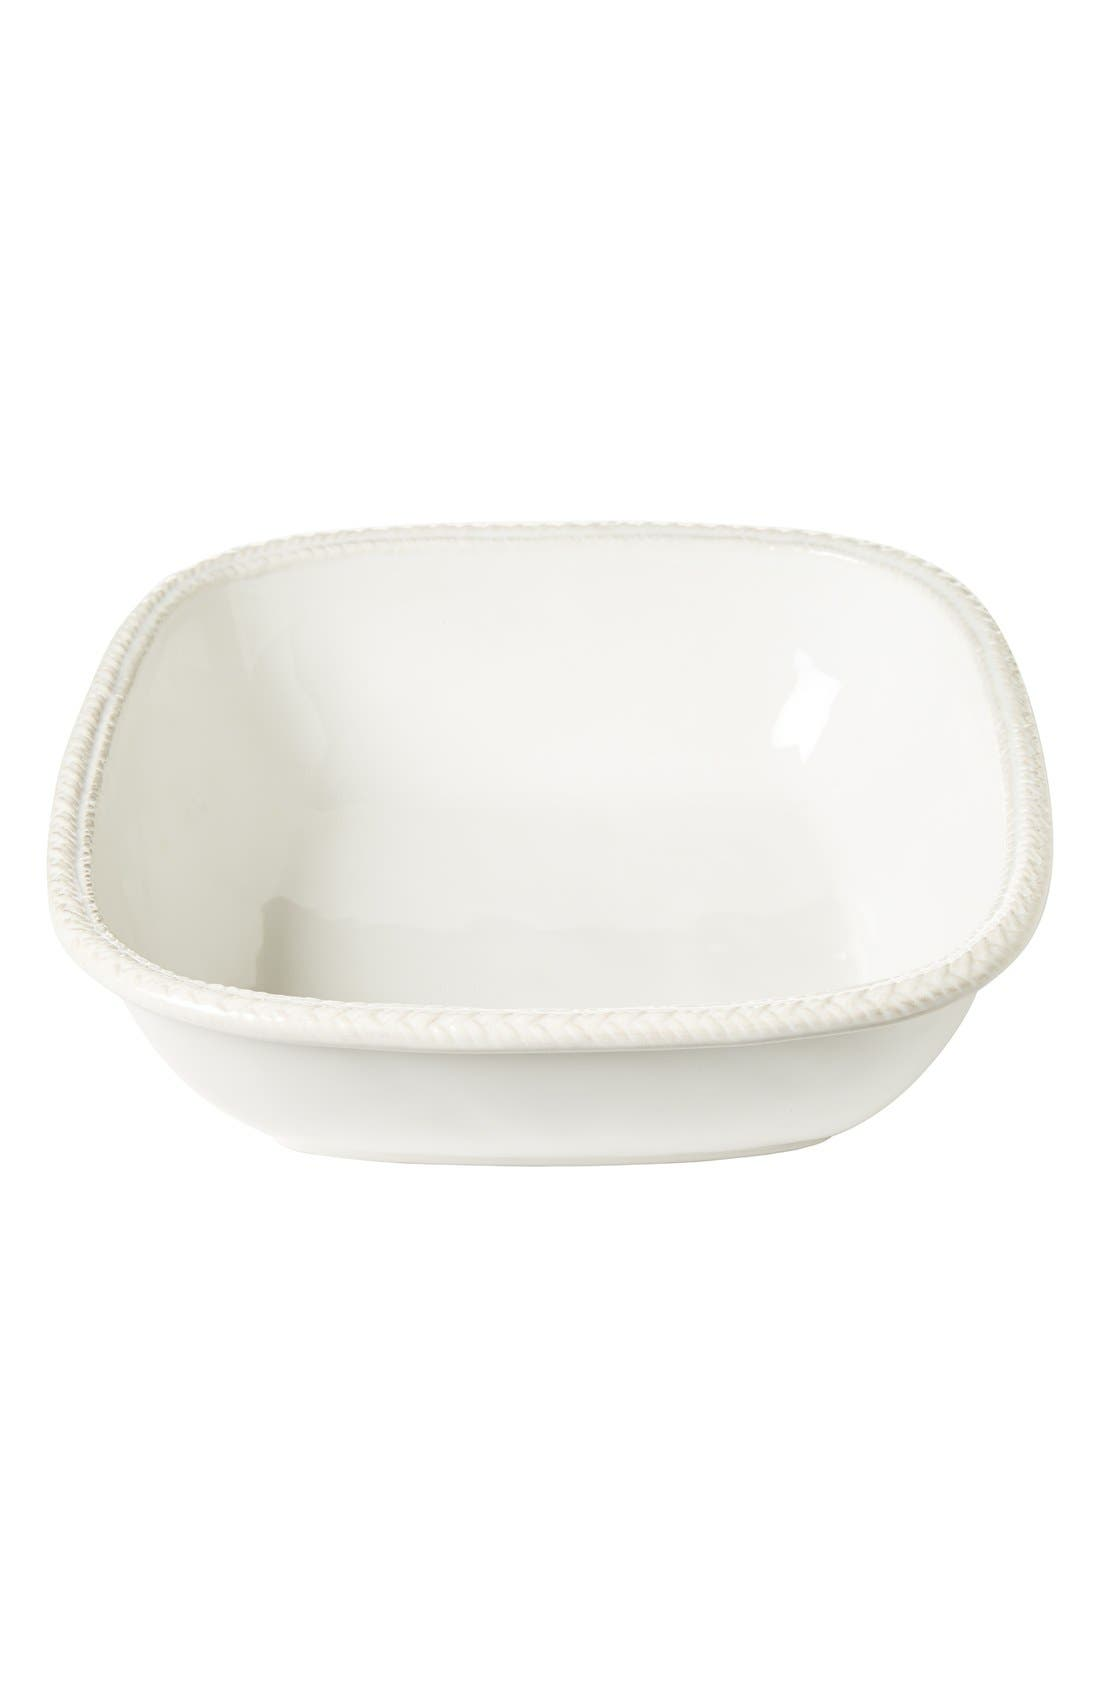 Le Panier Medium Ceramic Serving Bowl,                         Main,                         color, White